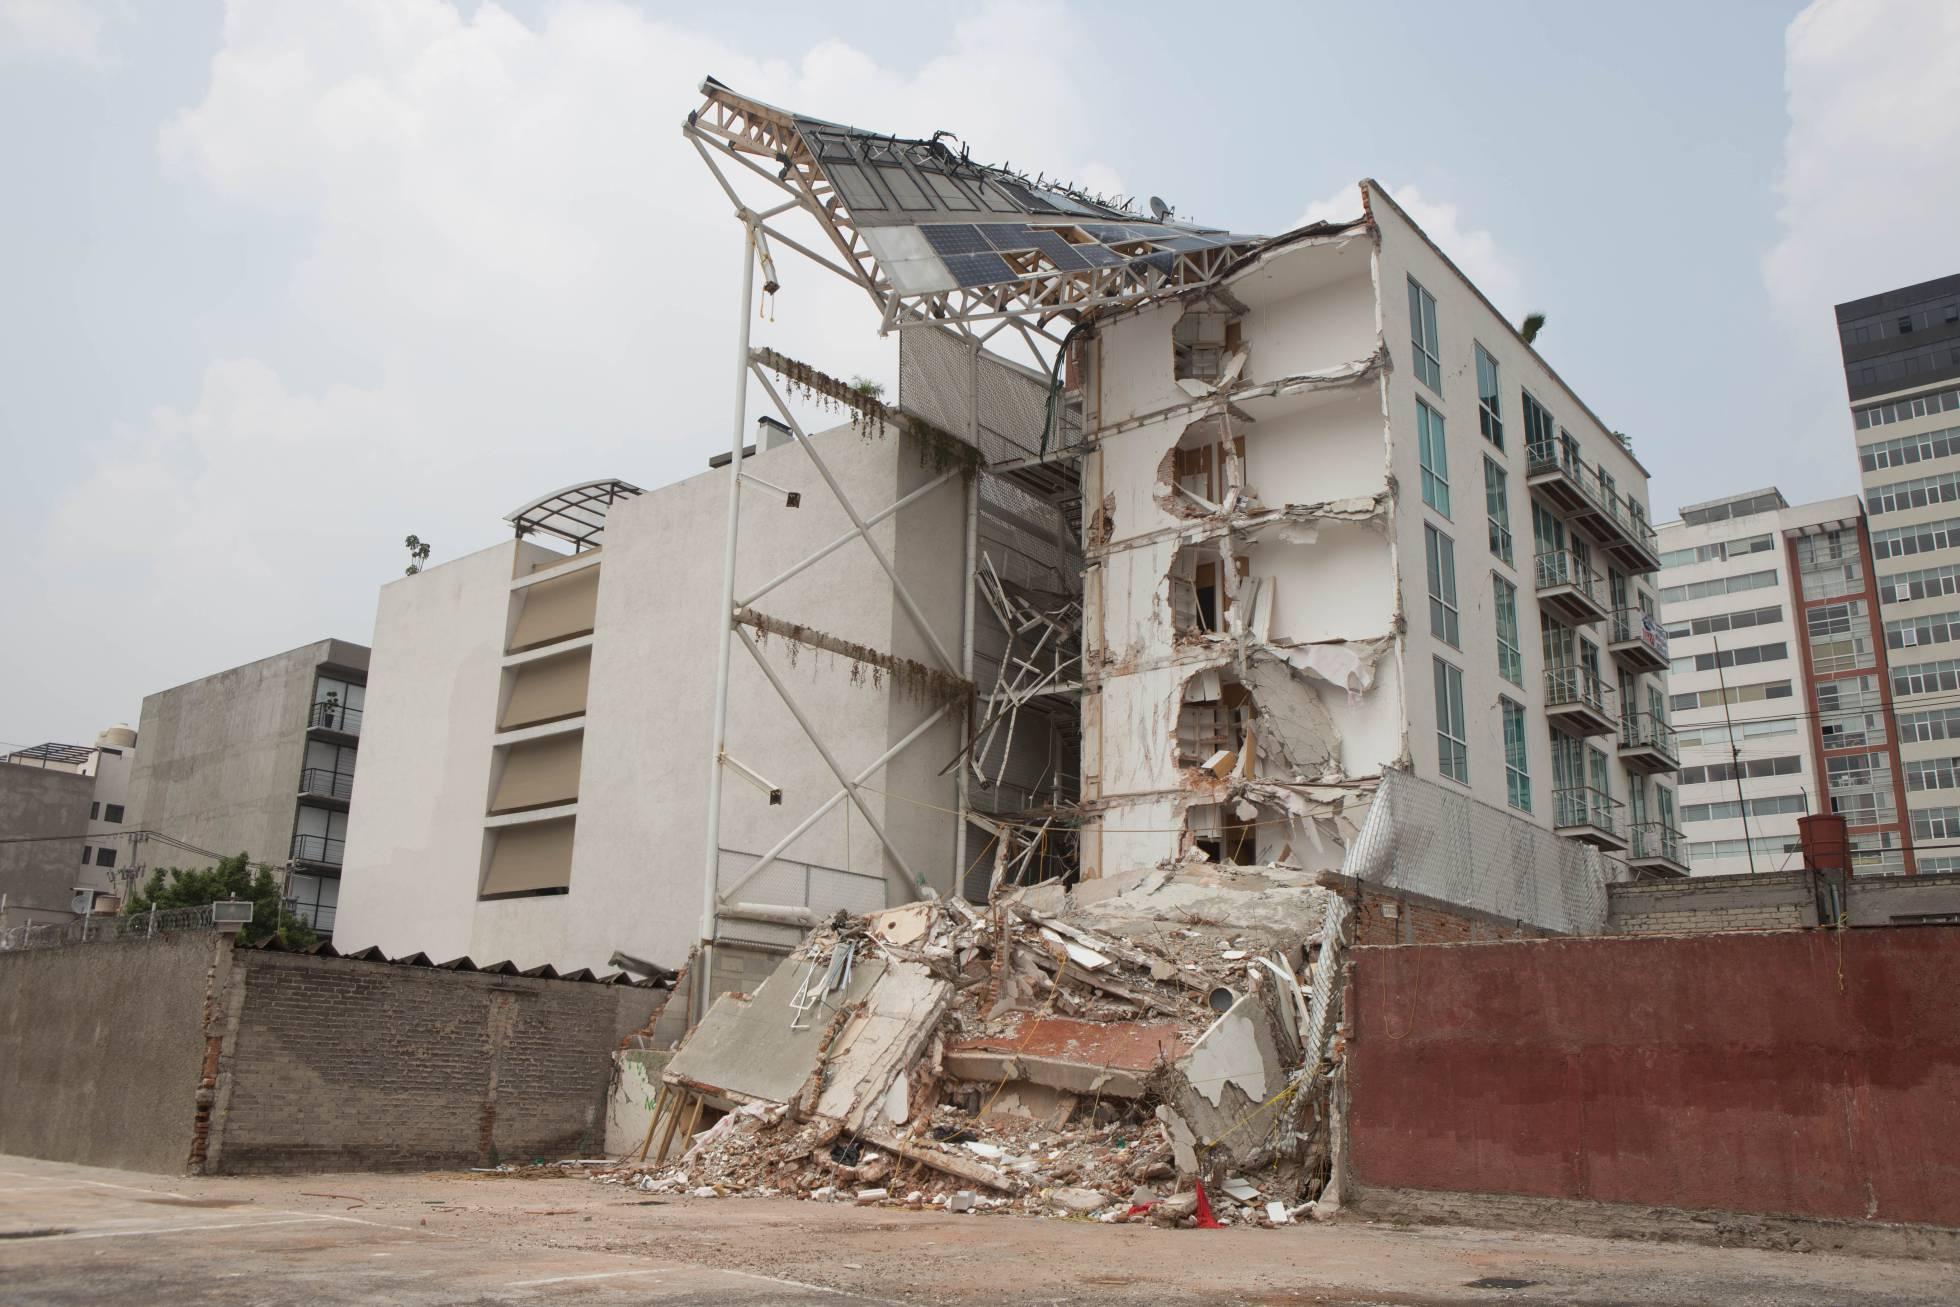 Arquitecto que diseñó edificio que colapsó en terremoto de México, será procesado